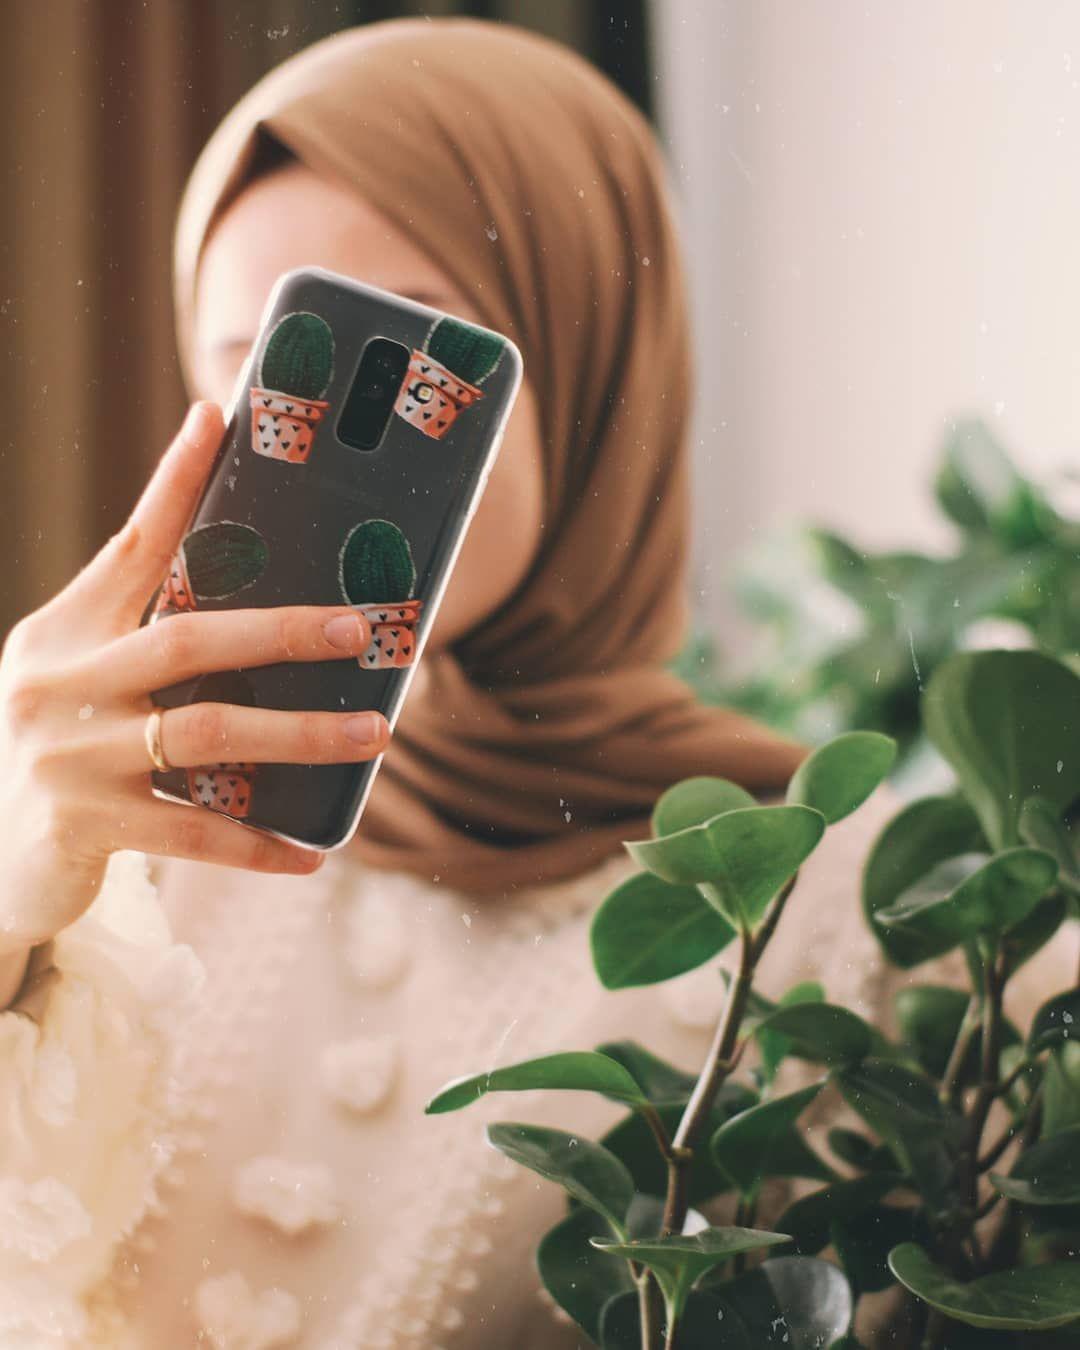 2 391 Likes 351 Comments محجبات Hijab Zenab 3mar On Instagram شو لون كفر موبايلك Hijabi Girl Girly Photography Modest Fashion Hijab